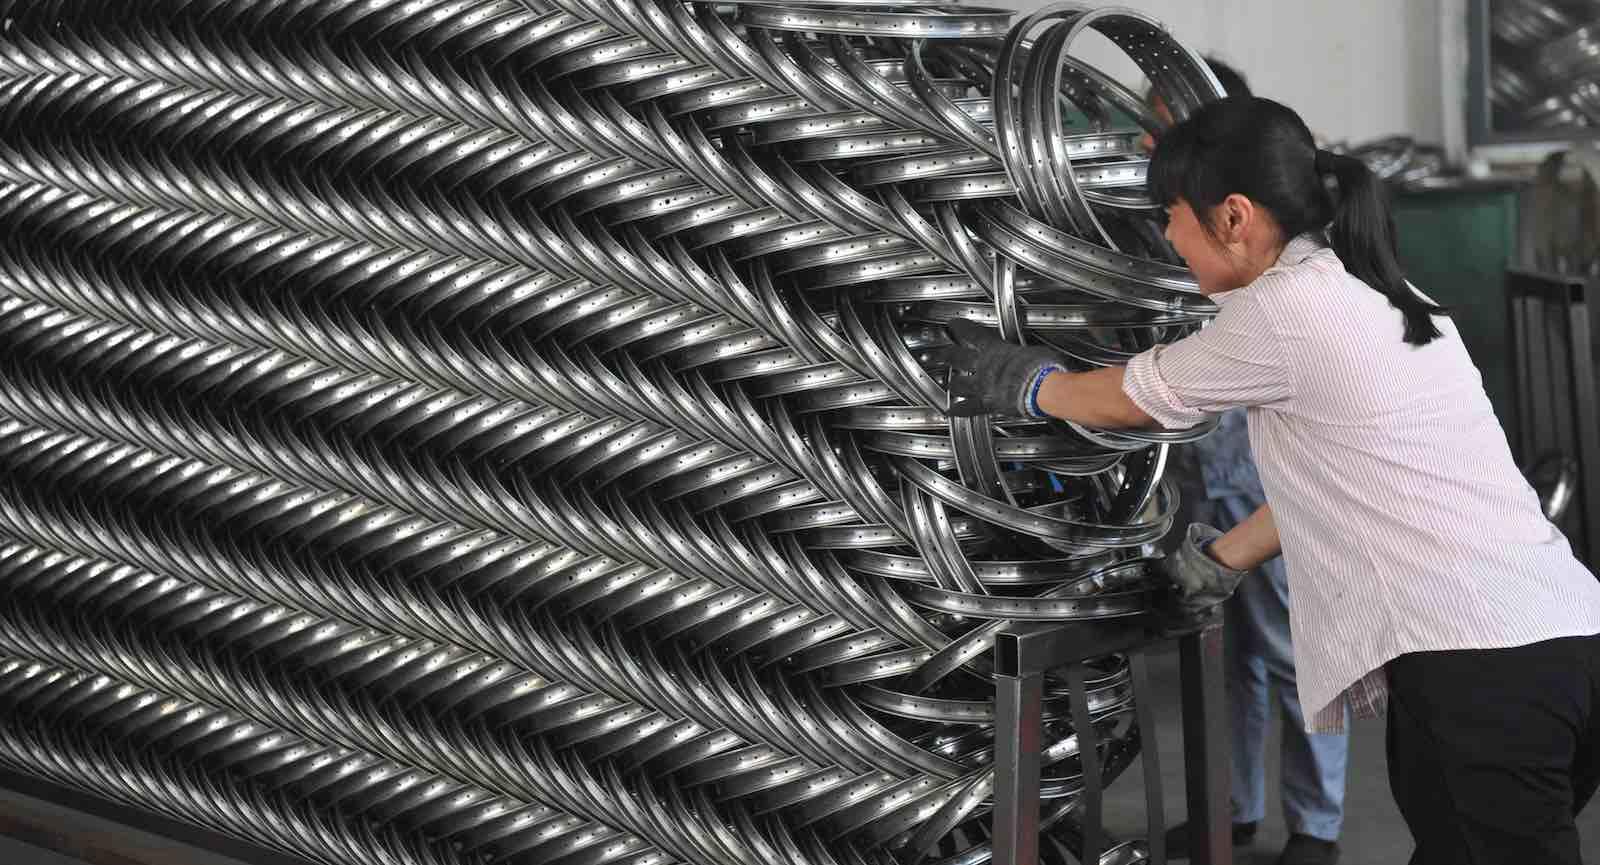 A steel wheel rims factory in Hangzhou, China (Photo: Barcroft Media via Getty)